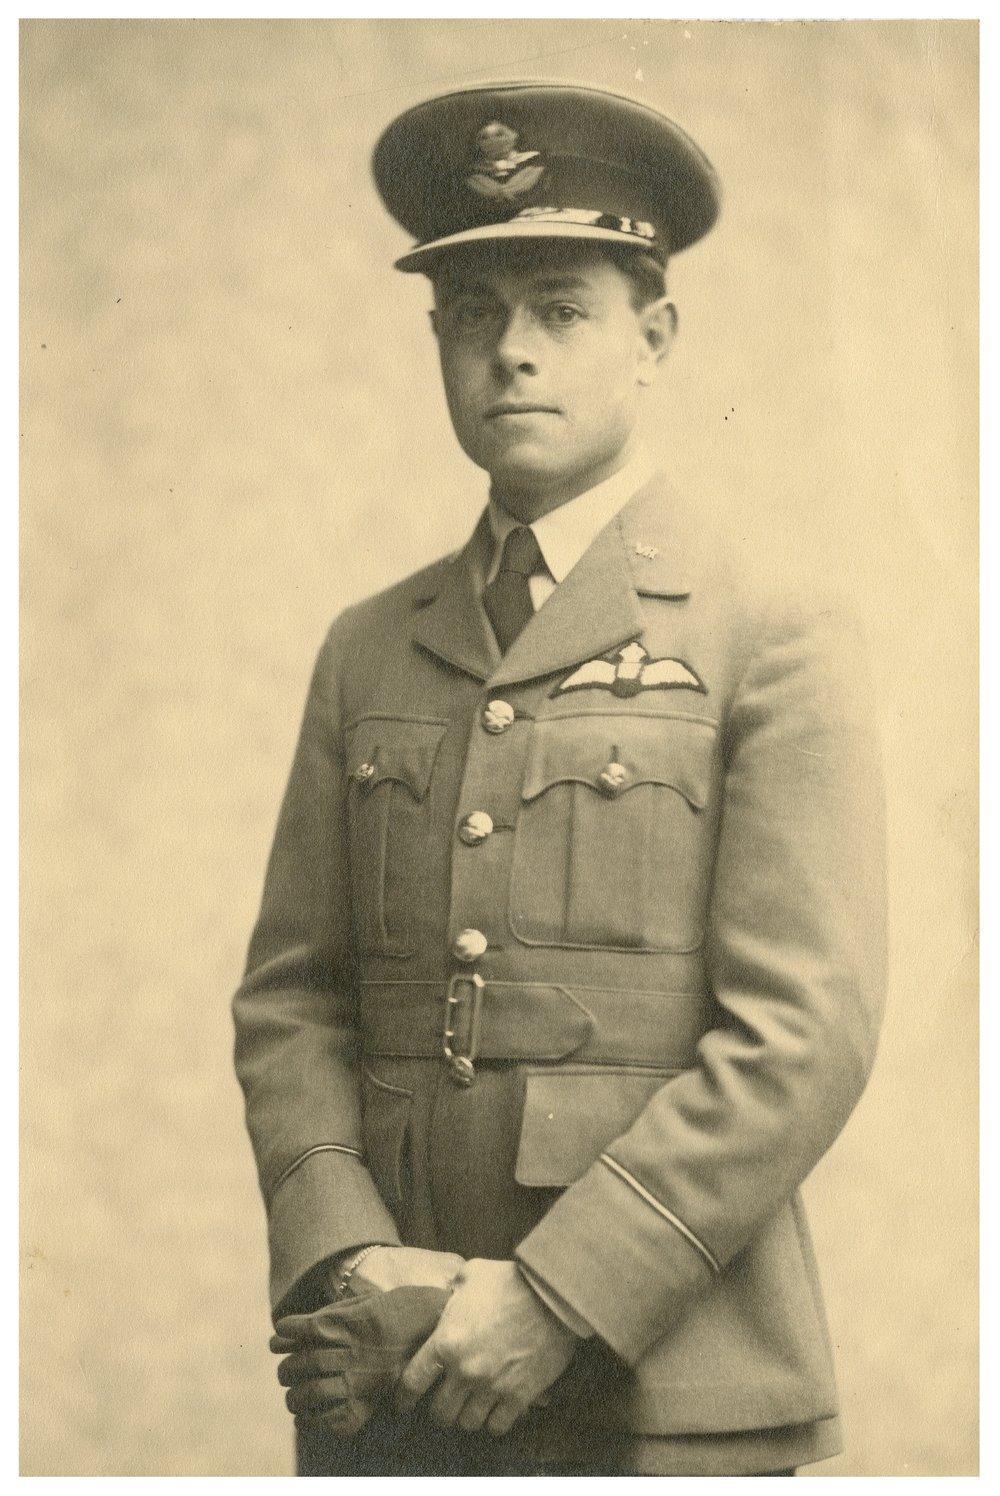 Robert S. Raymond